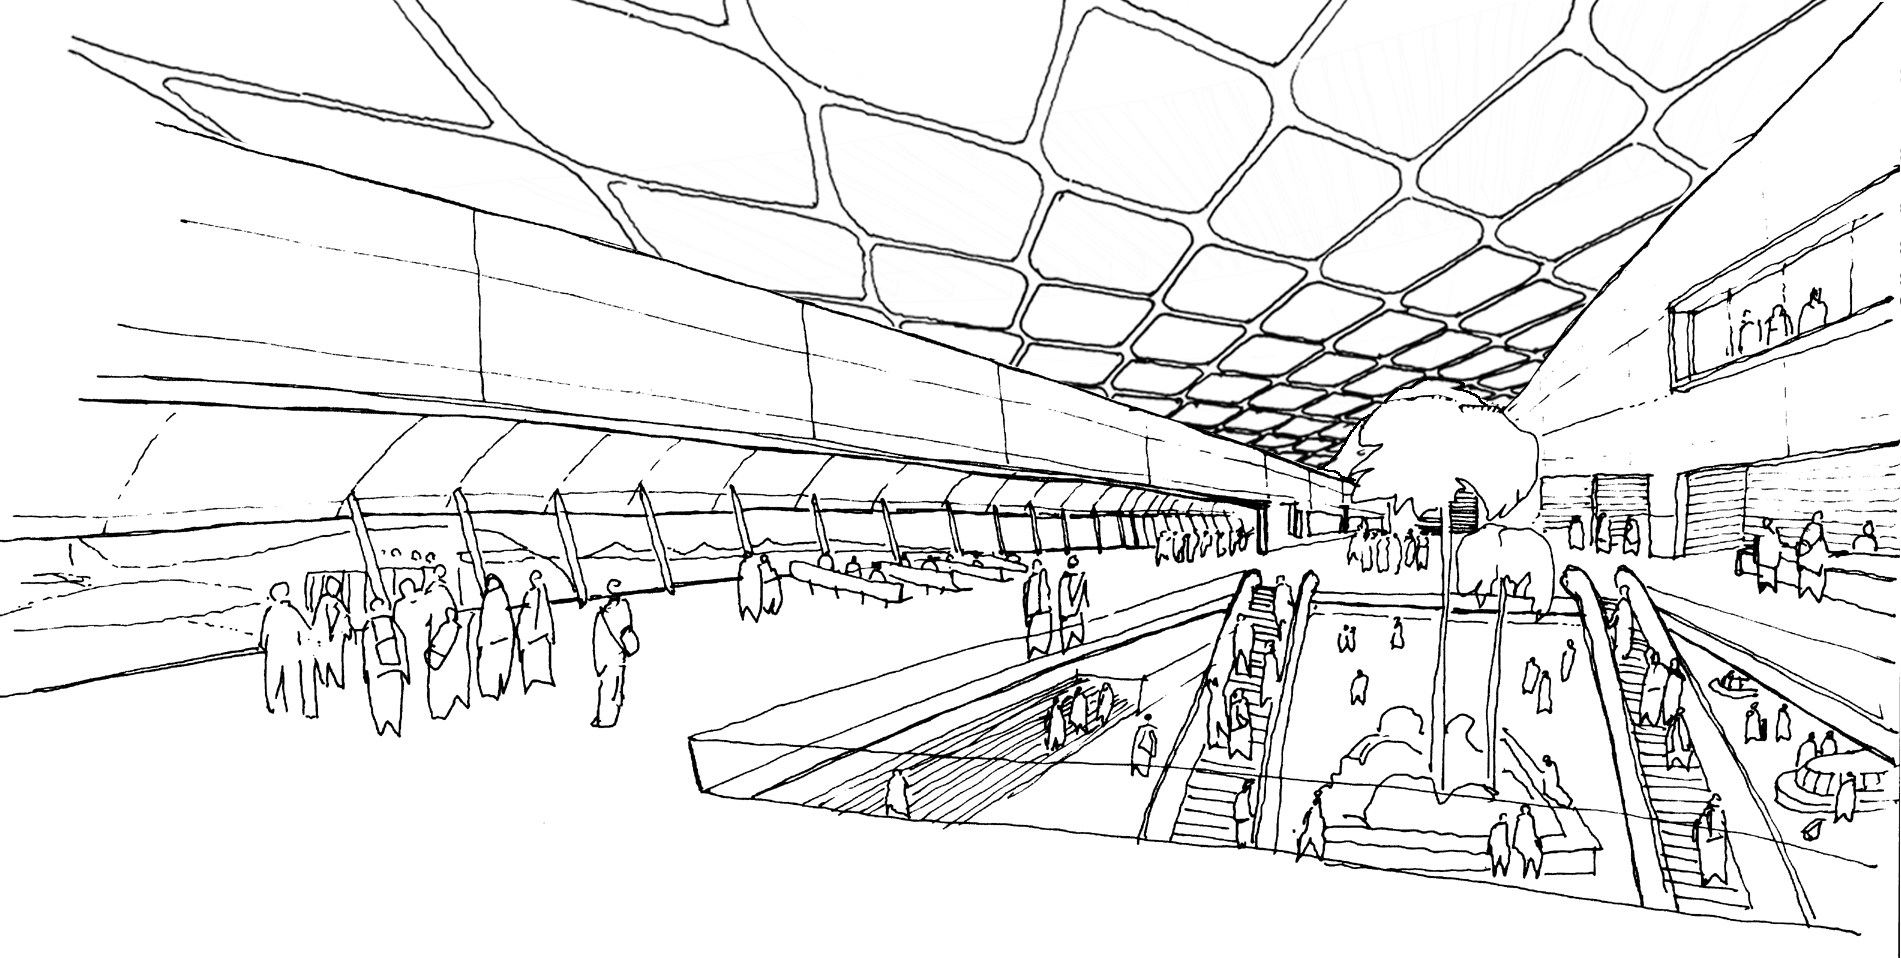 Shanghai Hongqiao Airport Masterplan Terminal 2 Concept Concourse 2005